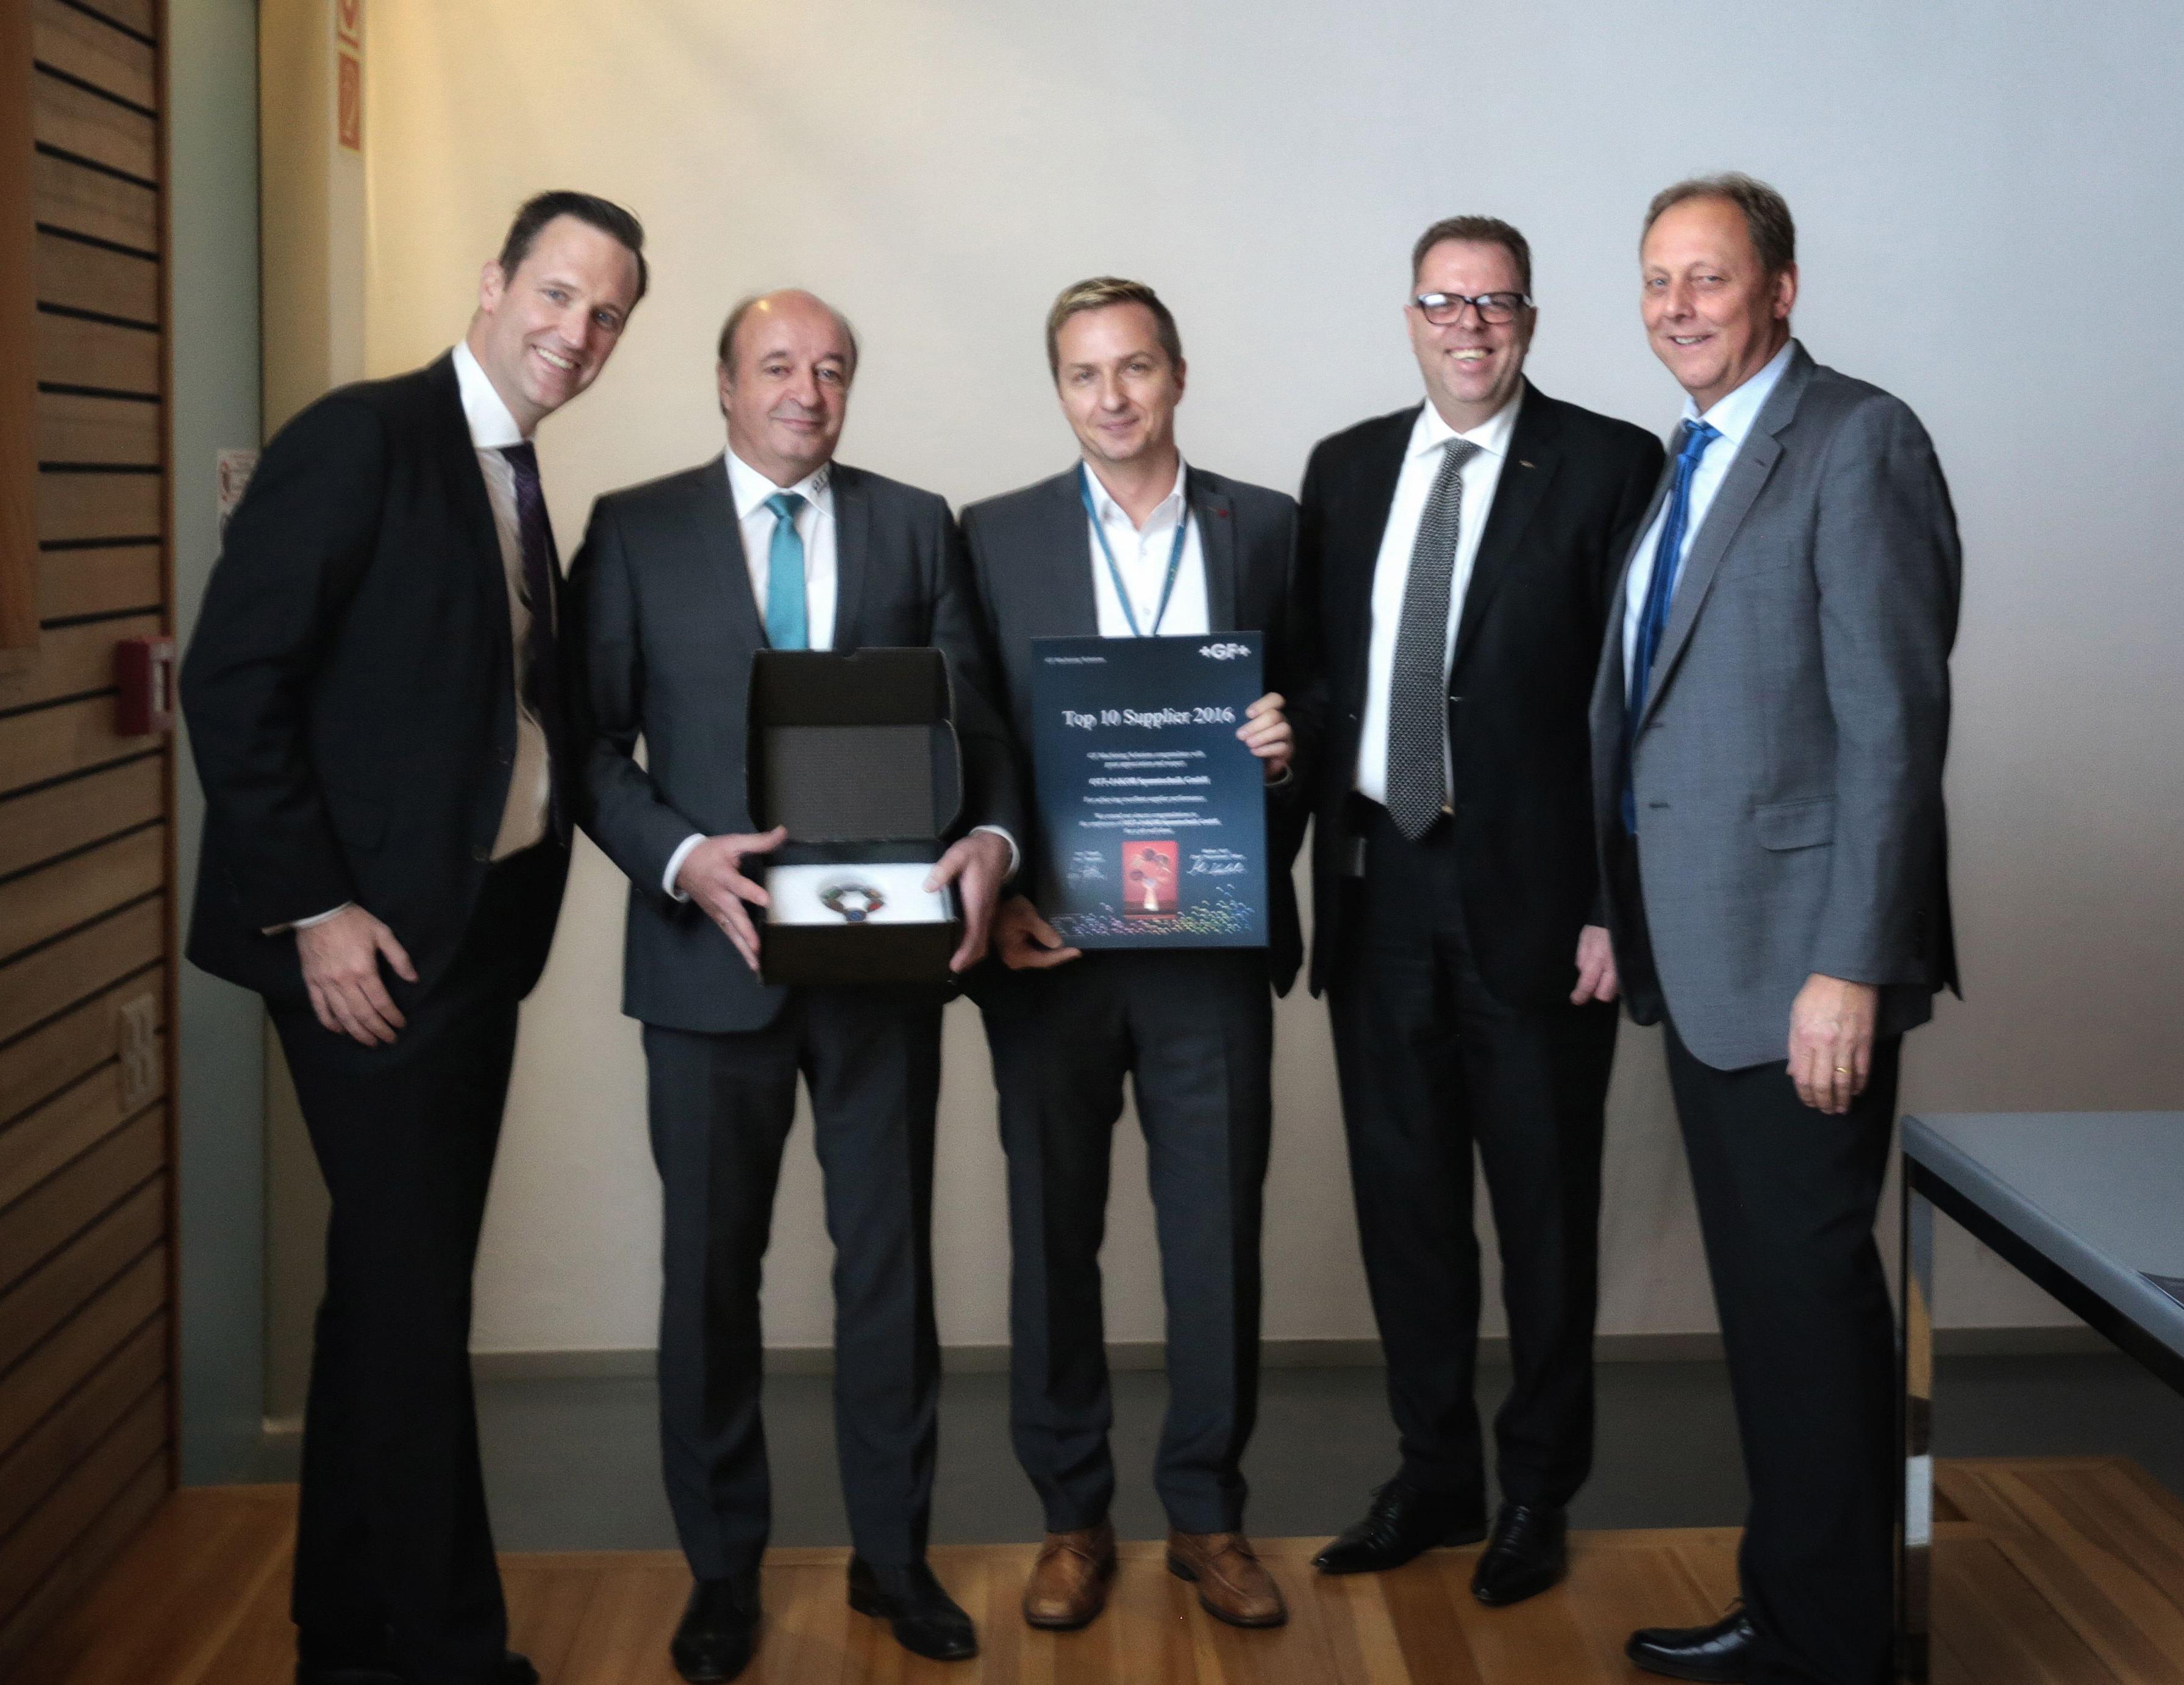 OTT-JAKOB - Unternehmen - Bild - OTT-JAKOB receives supplier award